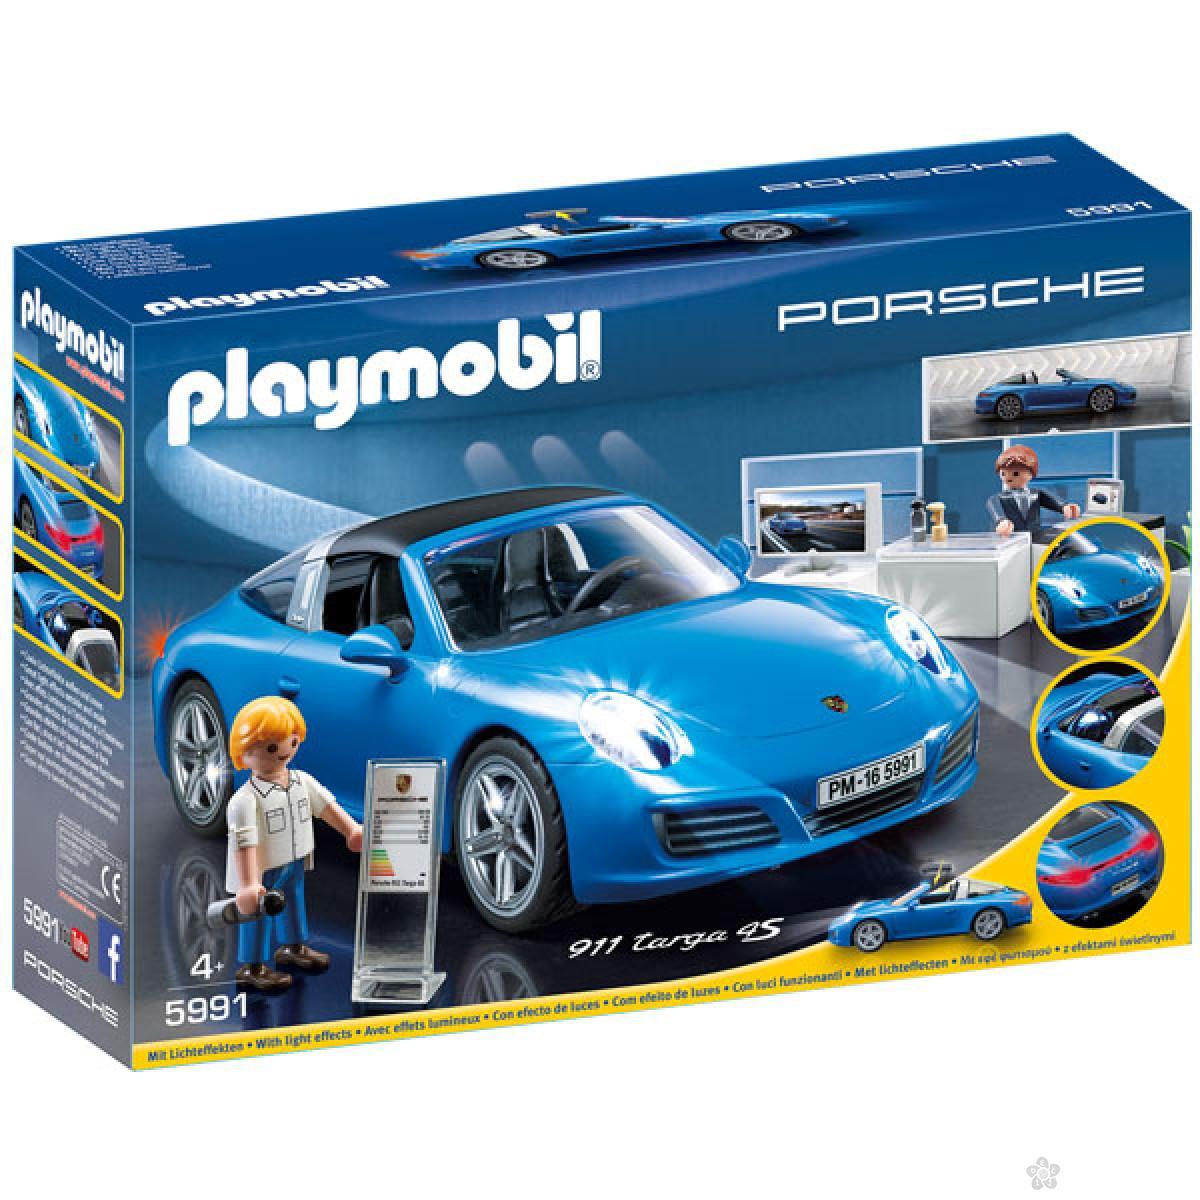 Playmobil Porsche 911 Targa 4s 19468